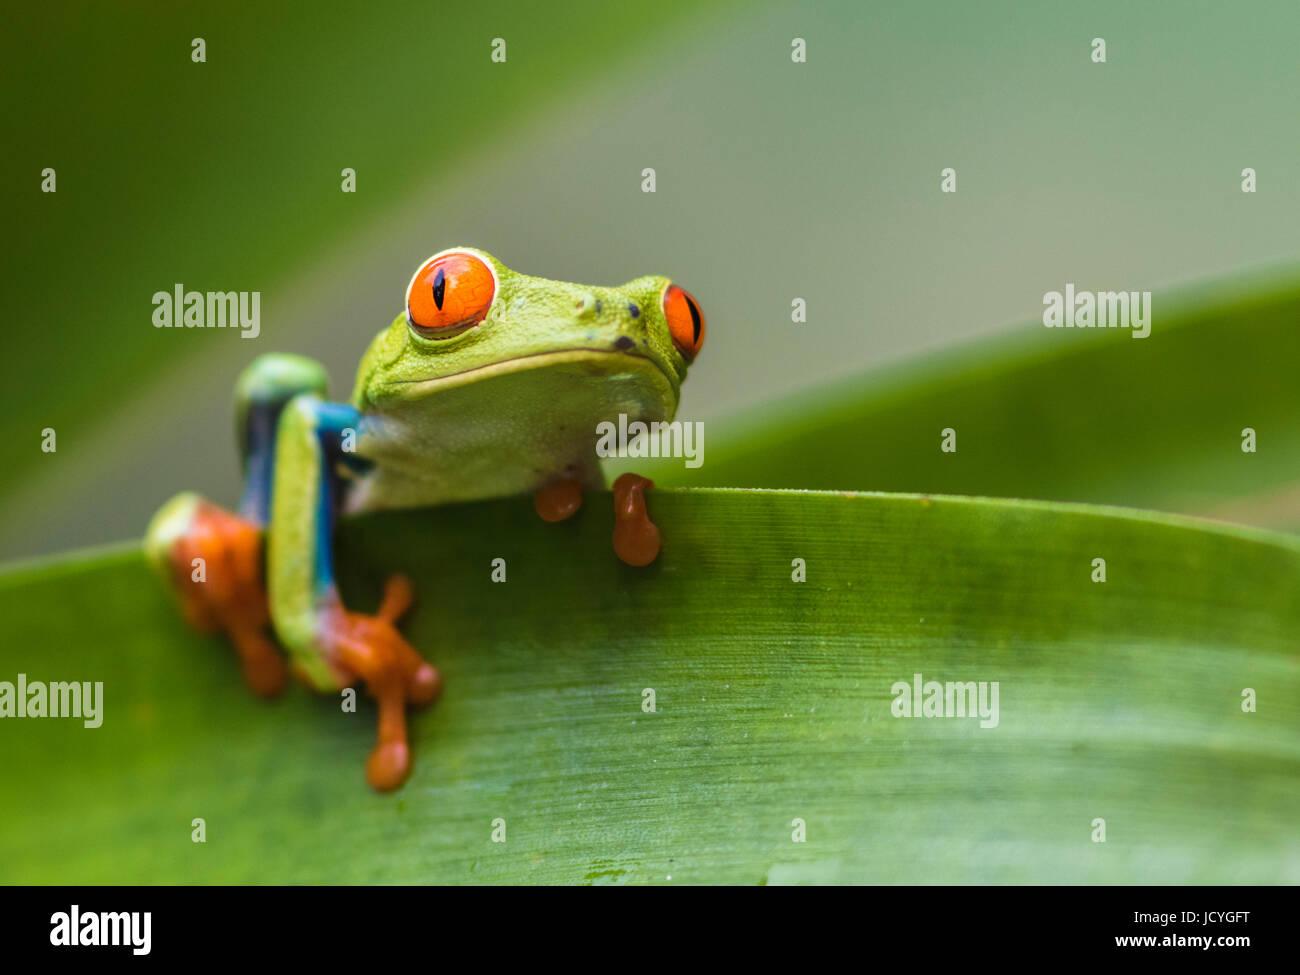 Red-eyed tree frog, Agalychnis callidryas, climbing on a leaf, looking in to the camera, Laguna del Lagarto, Boca Tapada, San Carlos, Costa Rica Stock Photo